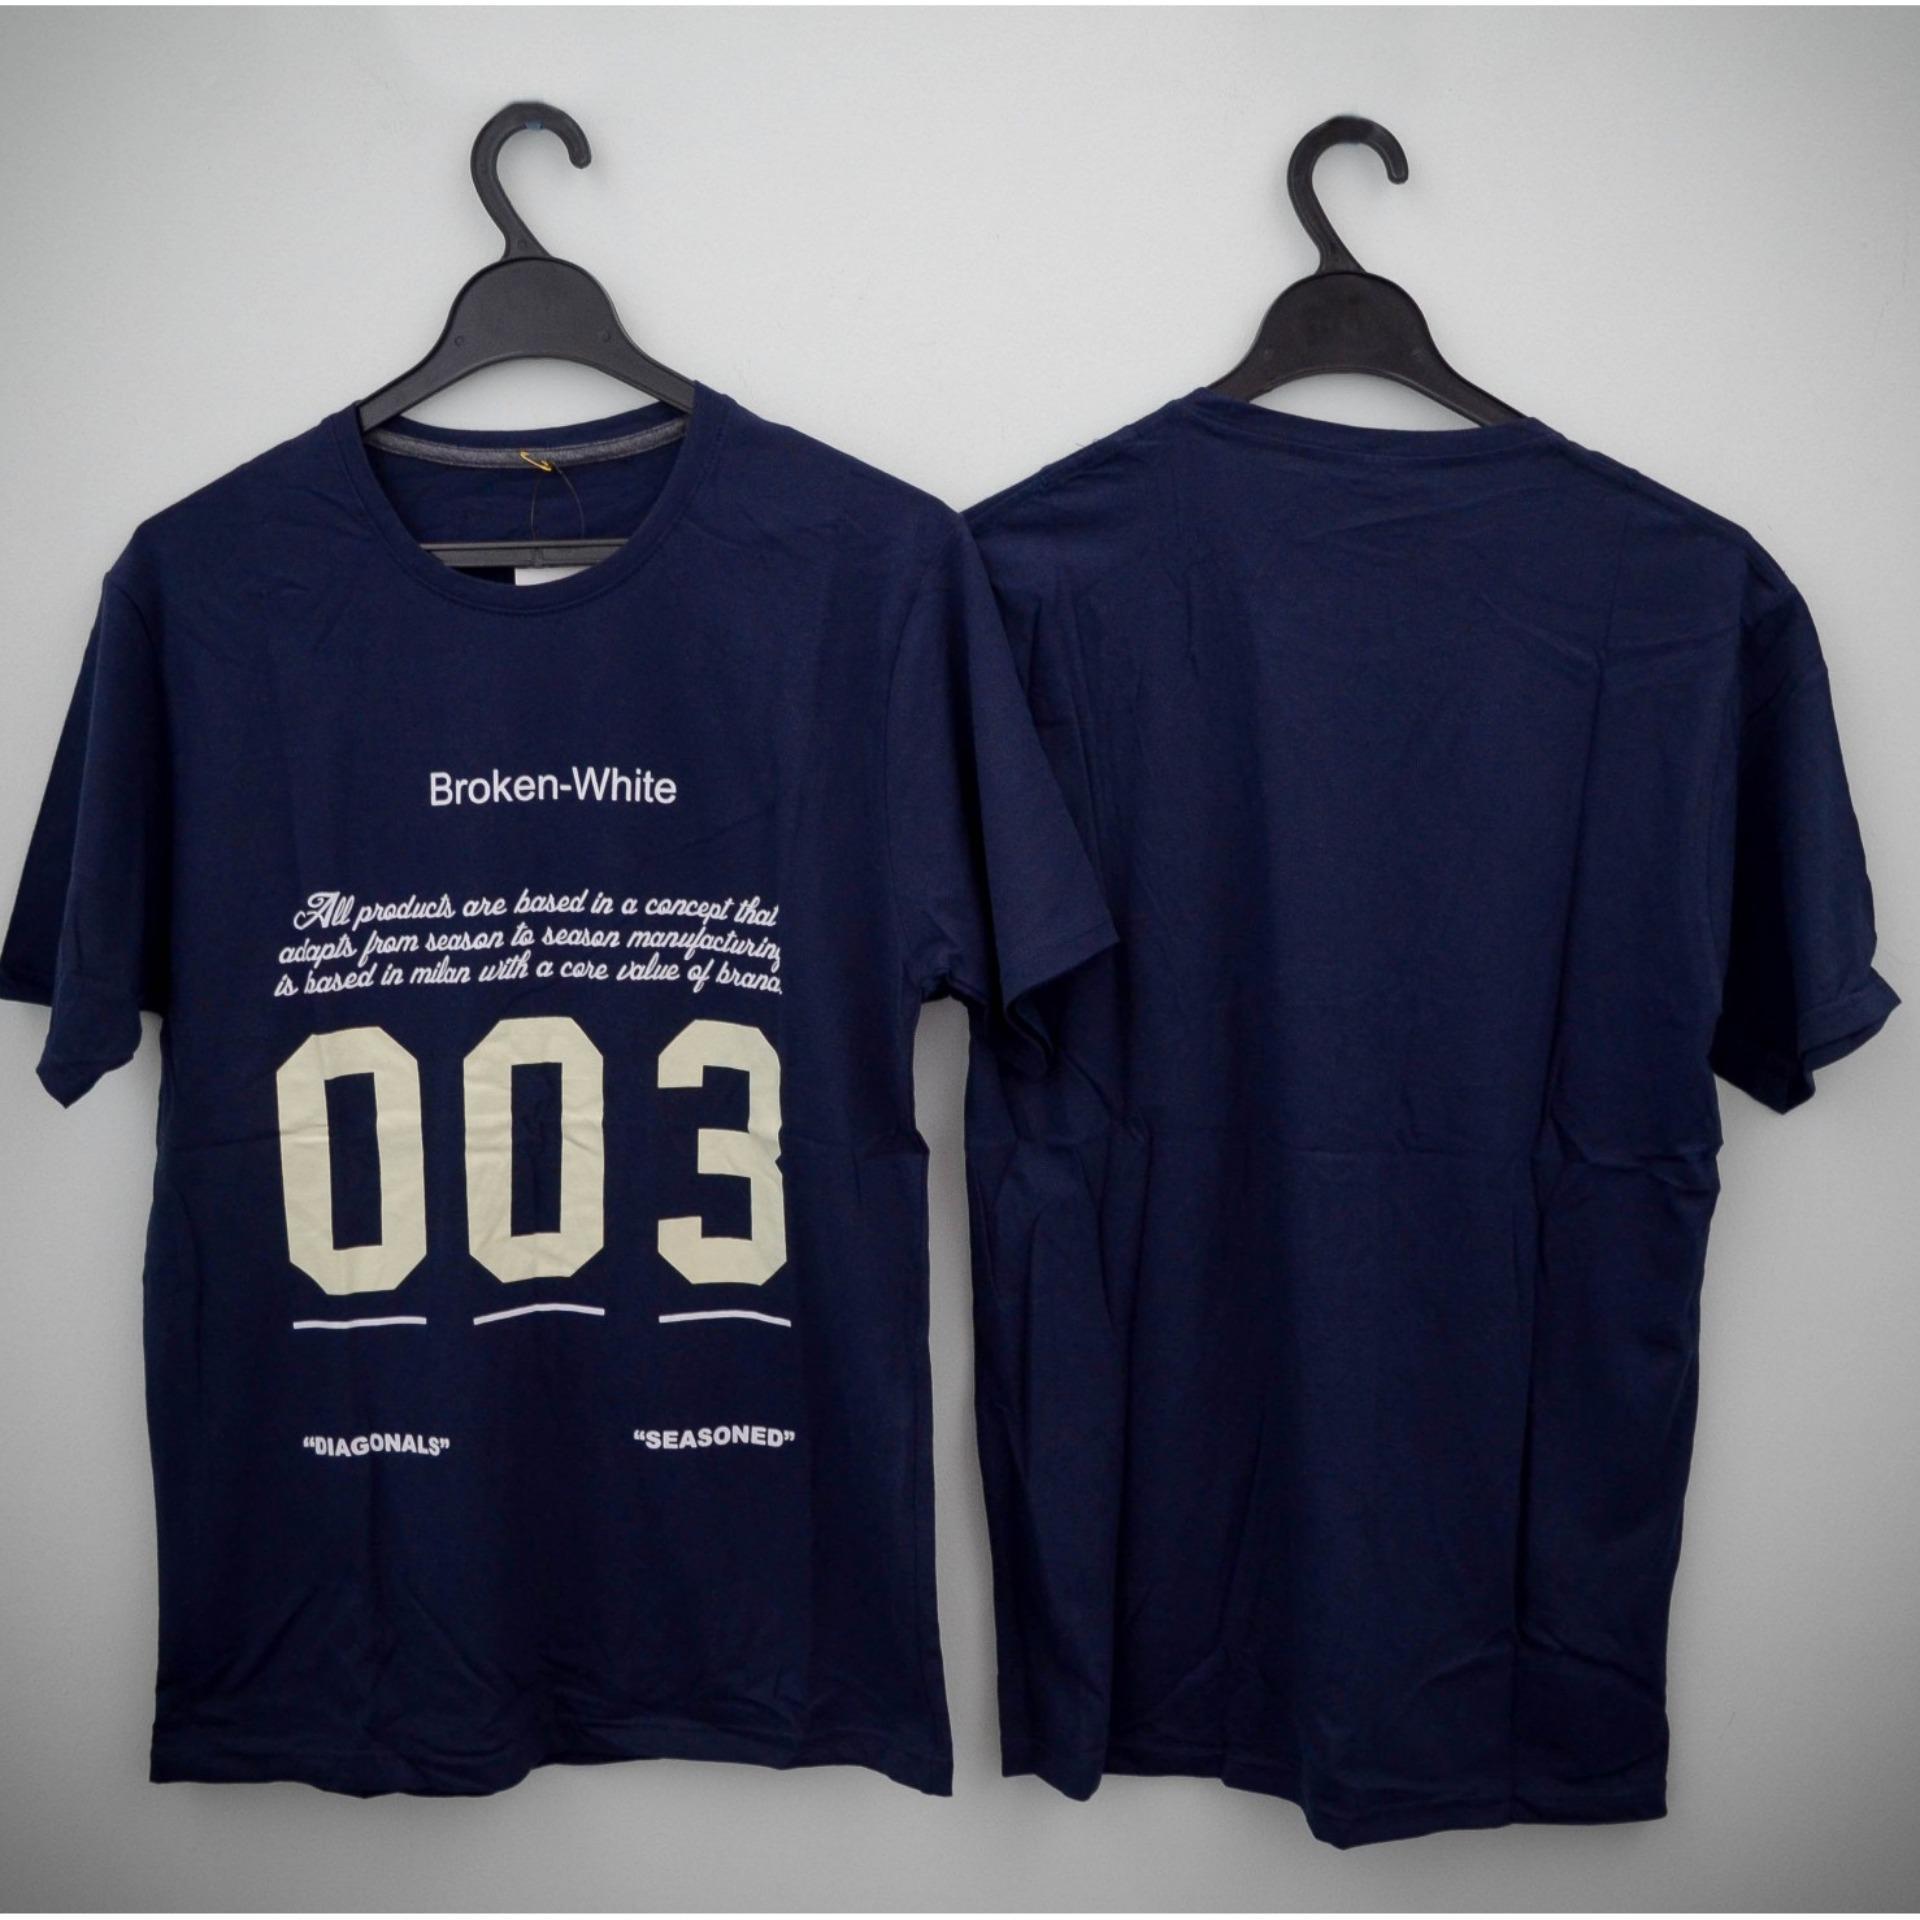 HIGH5 Fashion Pria Kaos Lengan Pendek BROKEN WHITE 003 Biru Navy